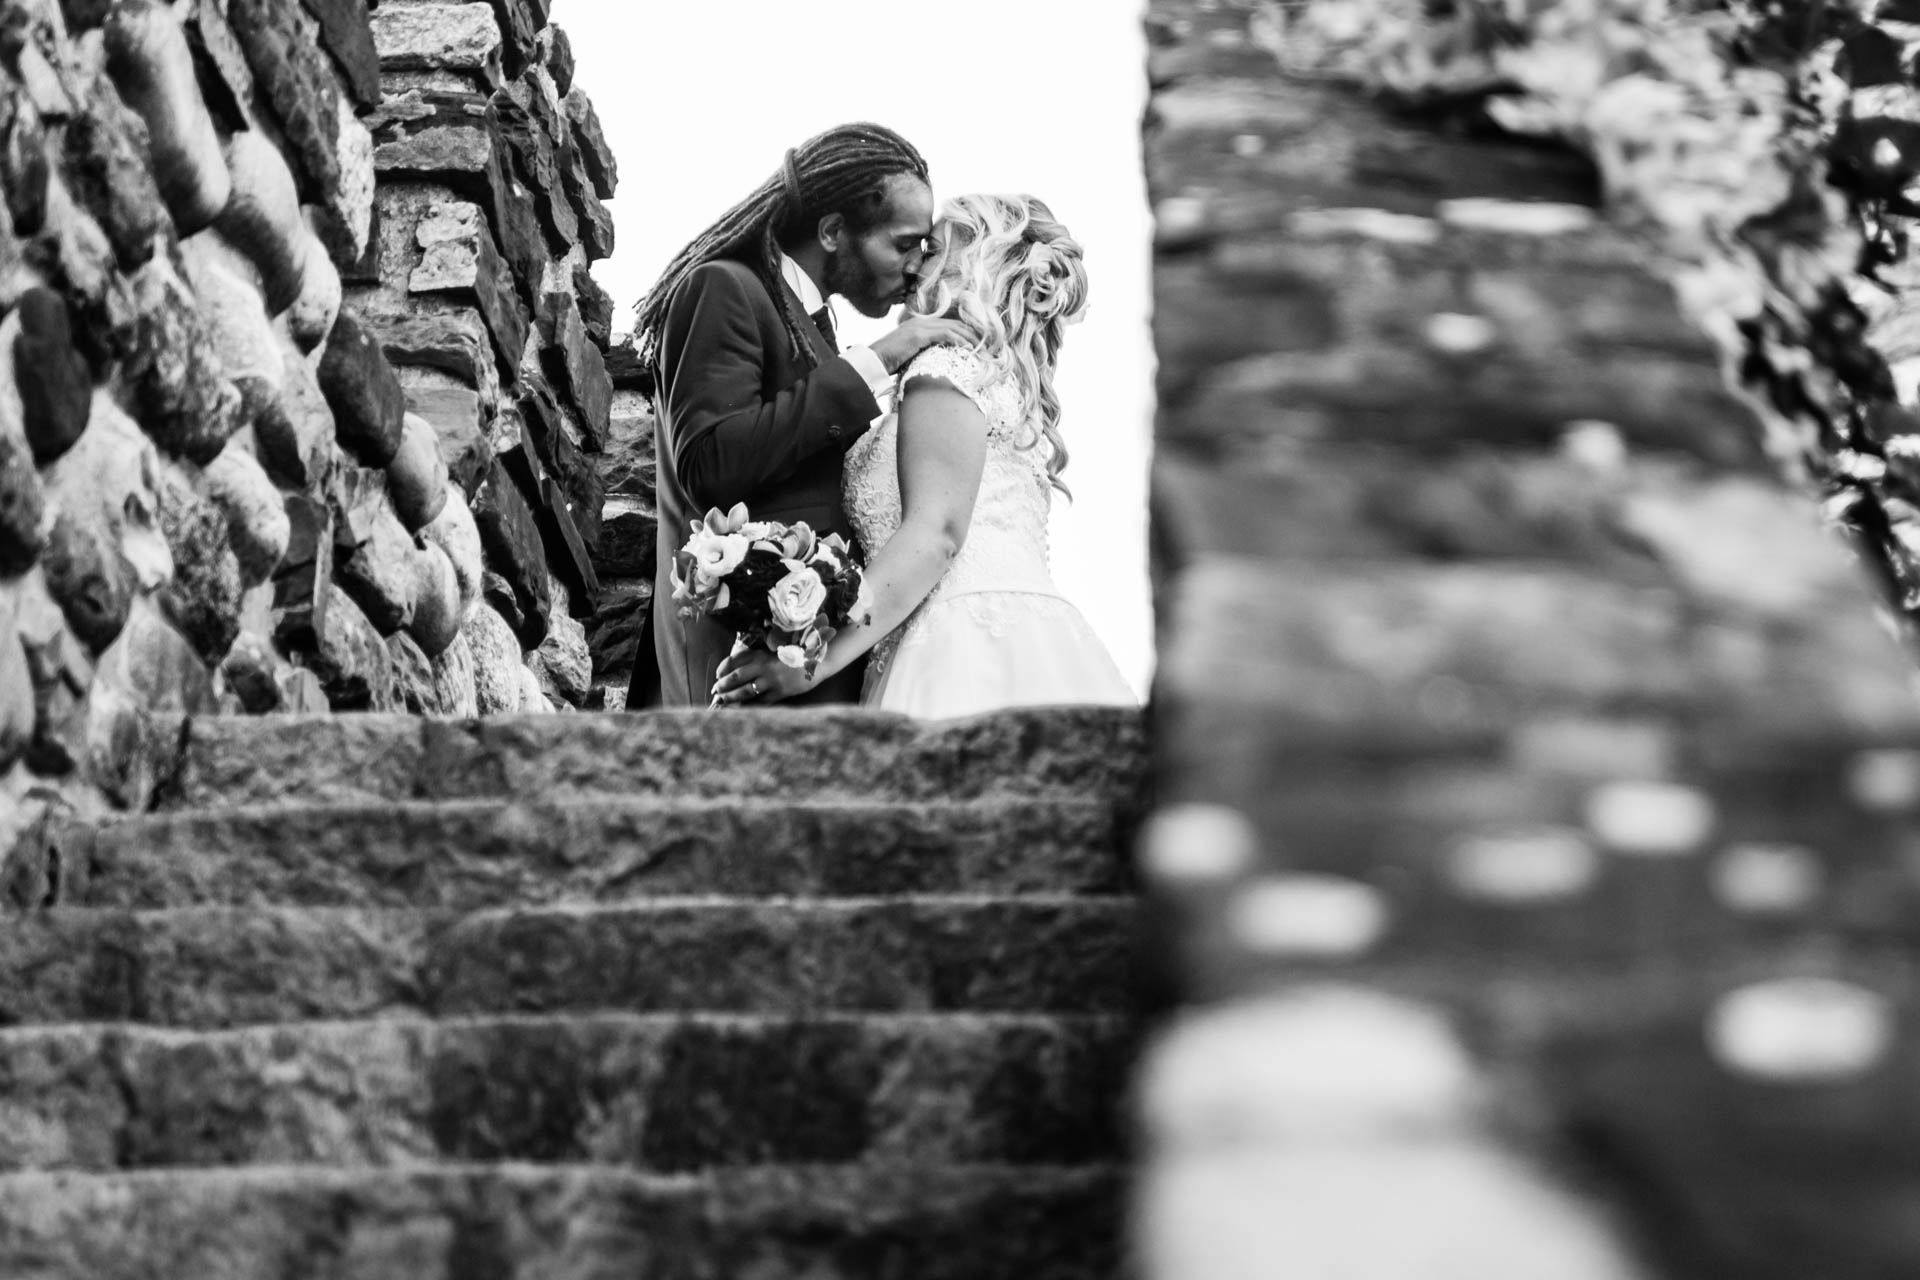 matrimonio sposi bacio bianco nero